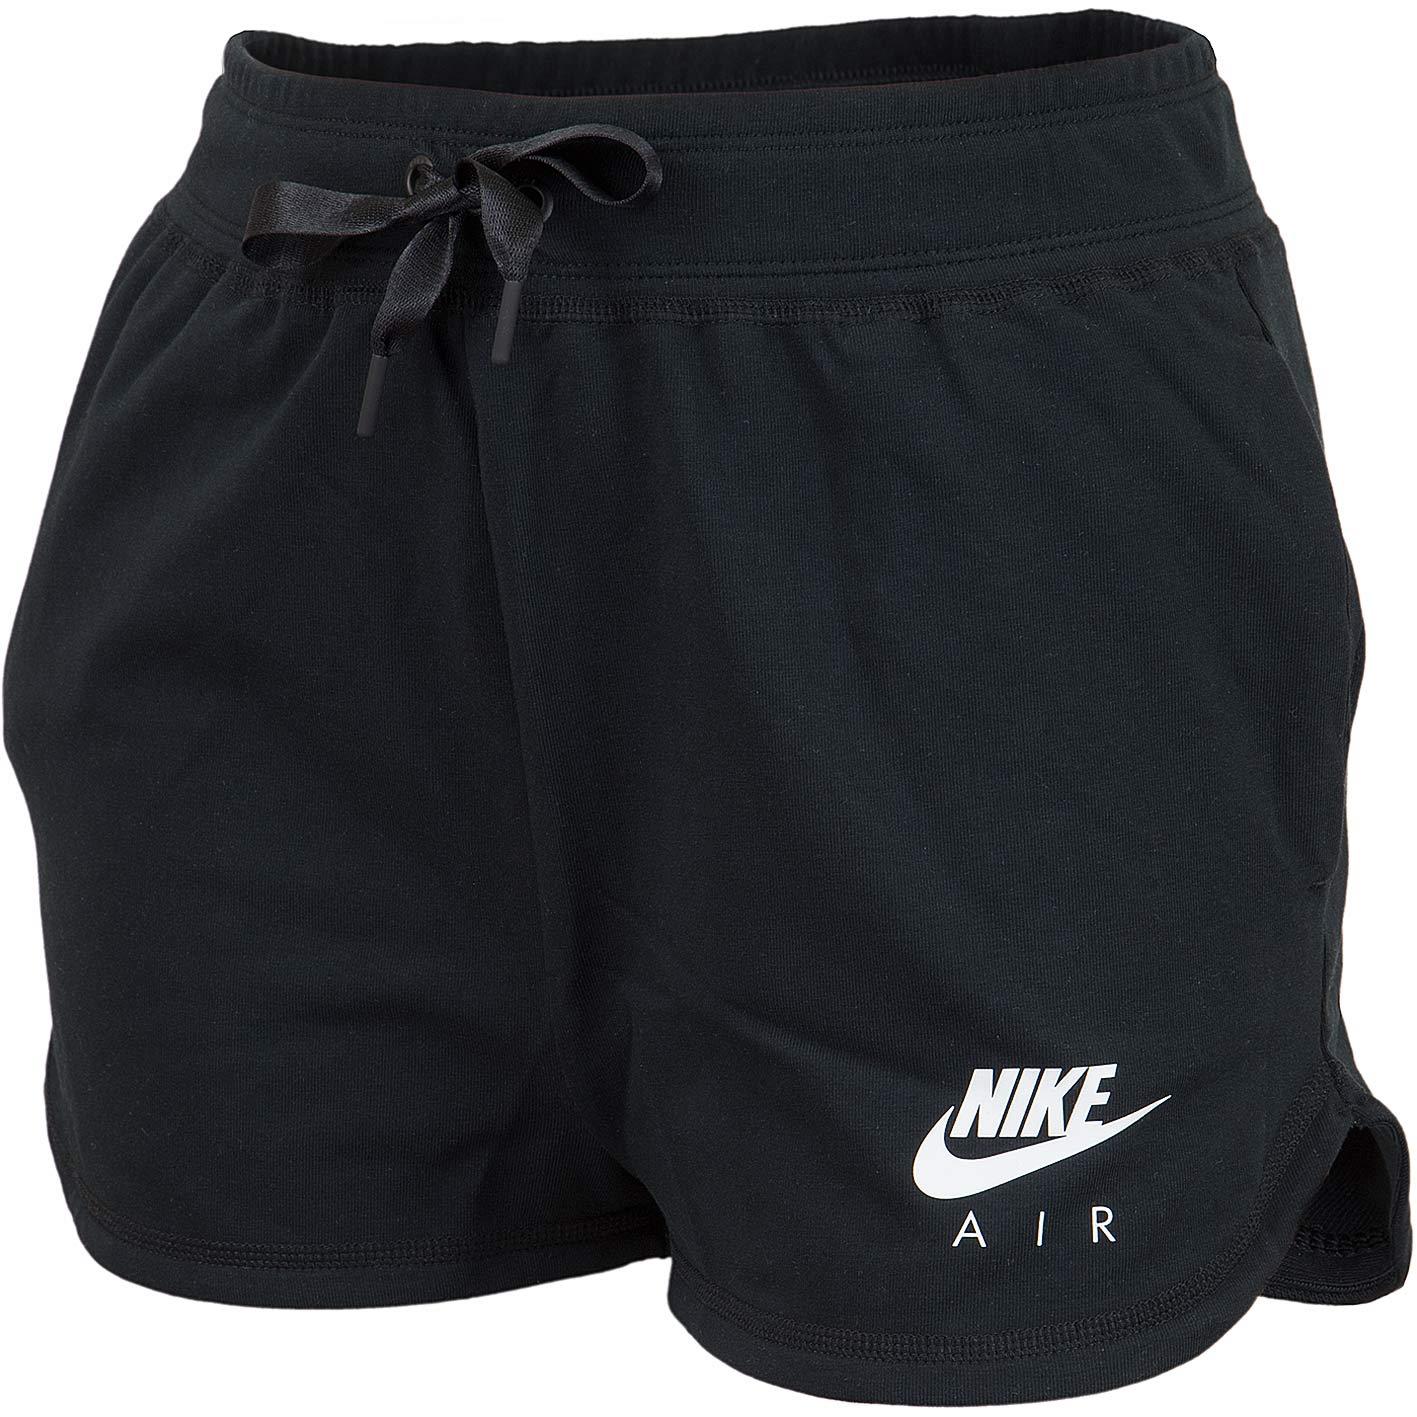 sneakers in stock new list Nike Damen Shorts Air schwarz/weiß